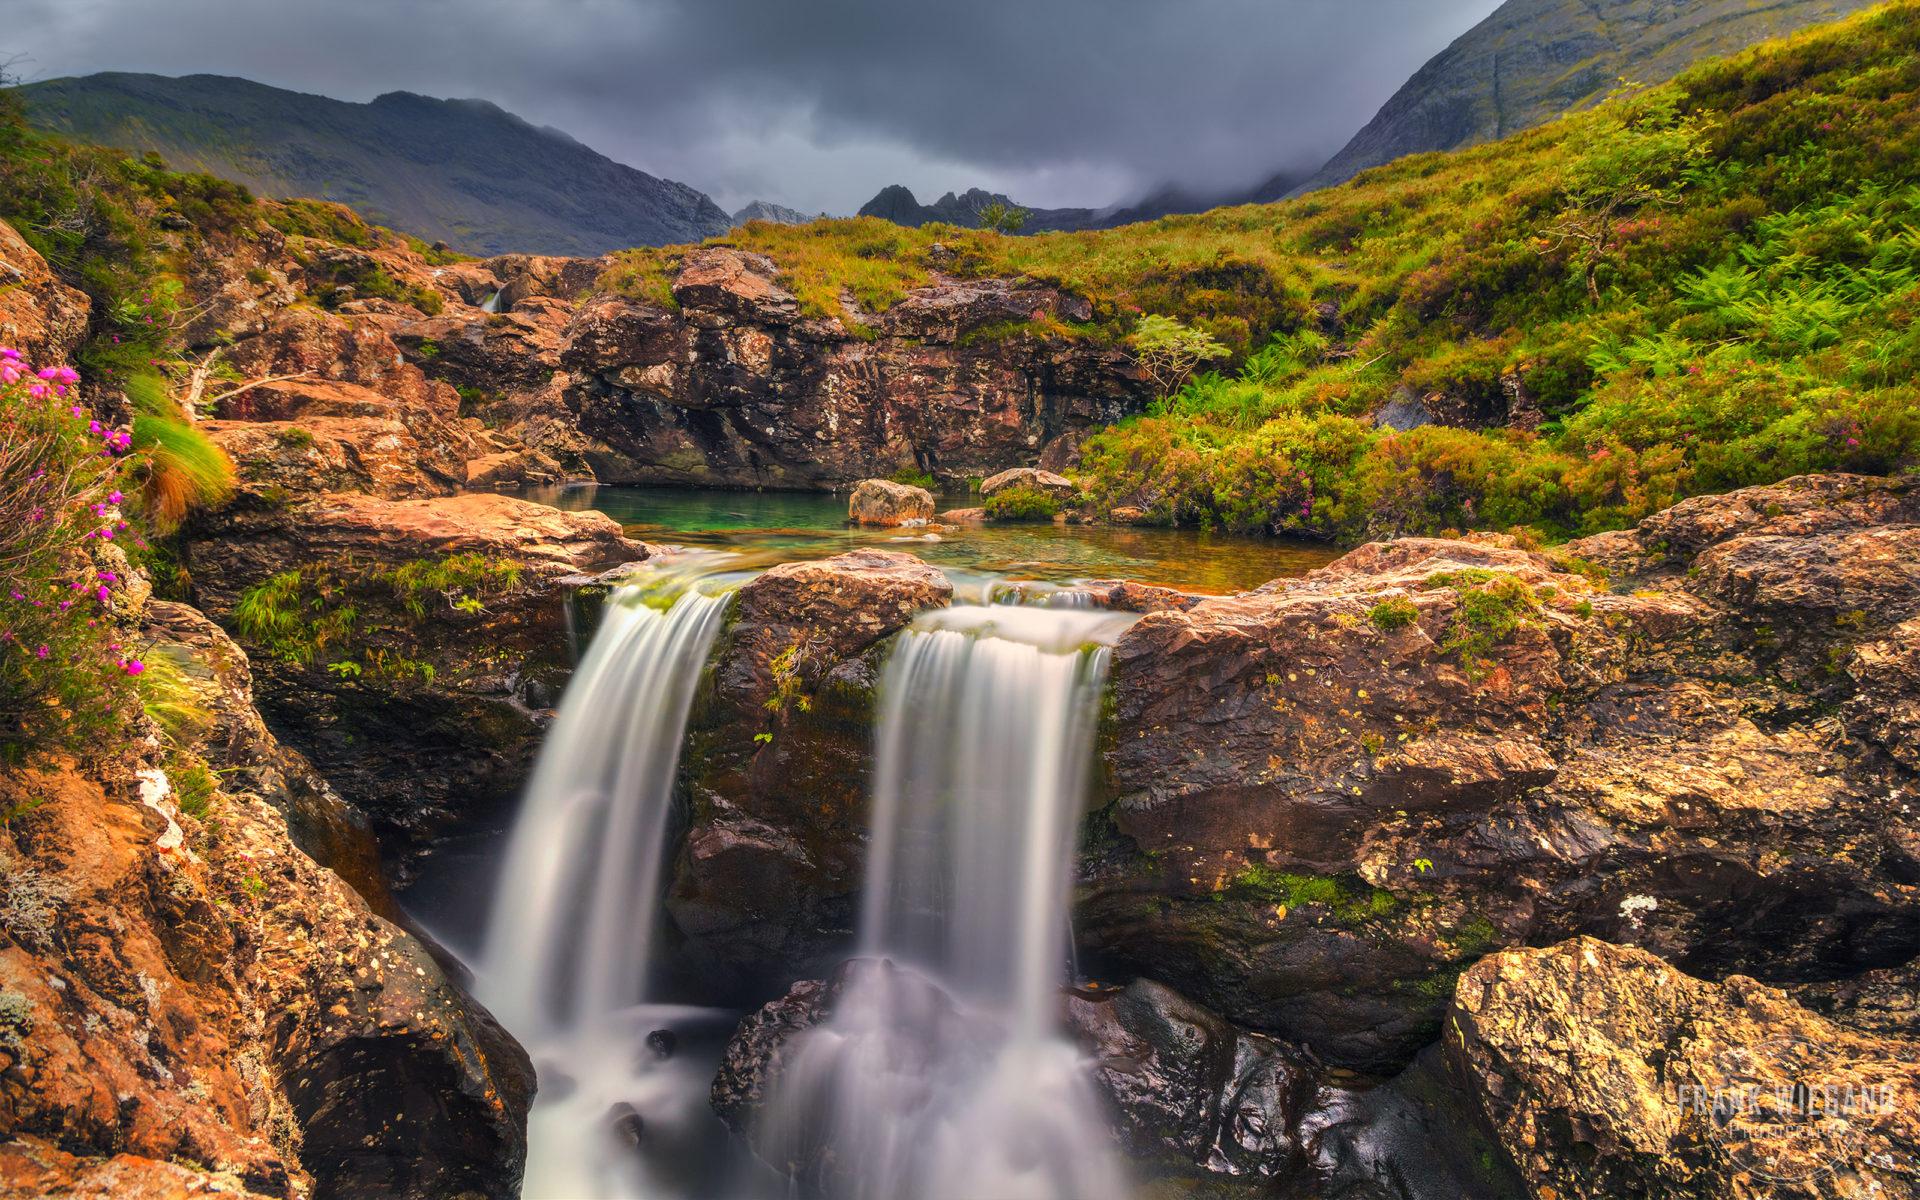 Beautiful Water Fall Scenery Wallpapers True Fairy Pools Isle Of Skye Scotland Wallpaper For